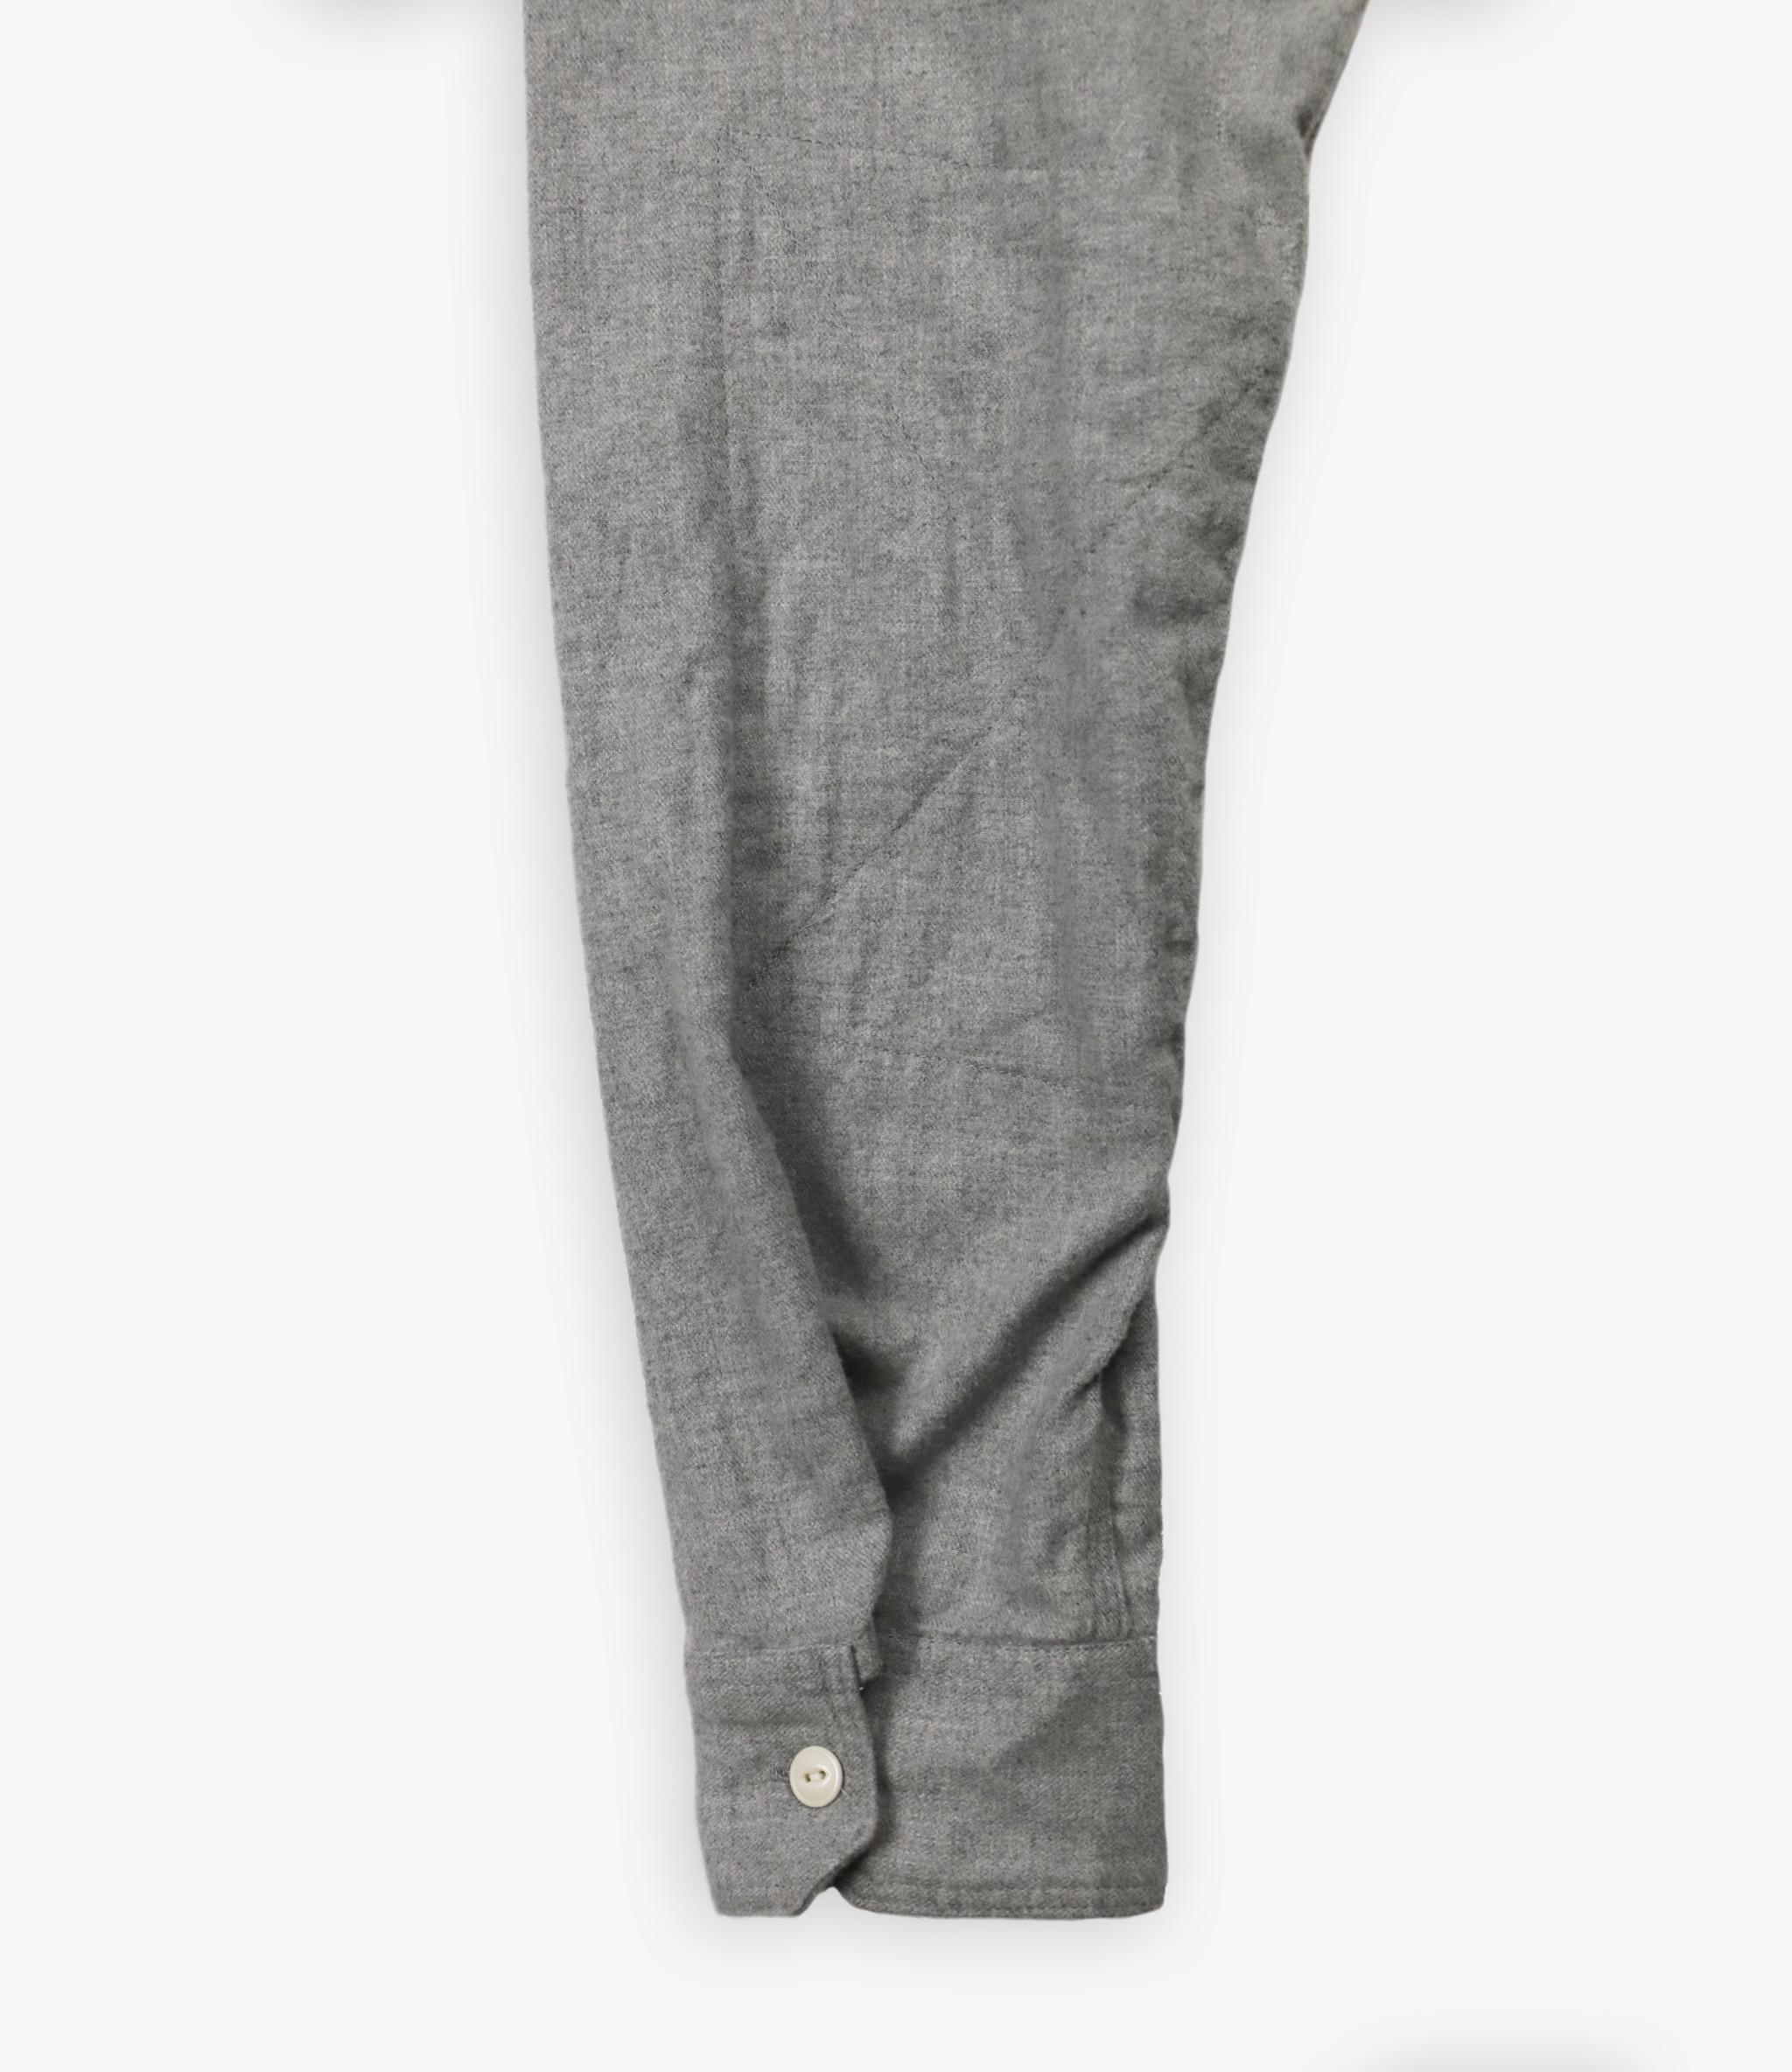 Engineered Garments Work Shirt - Lt.Grey Brushed Cotton Twill